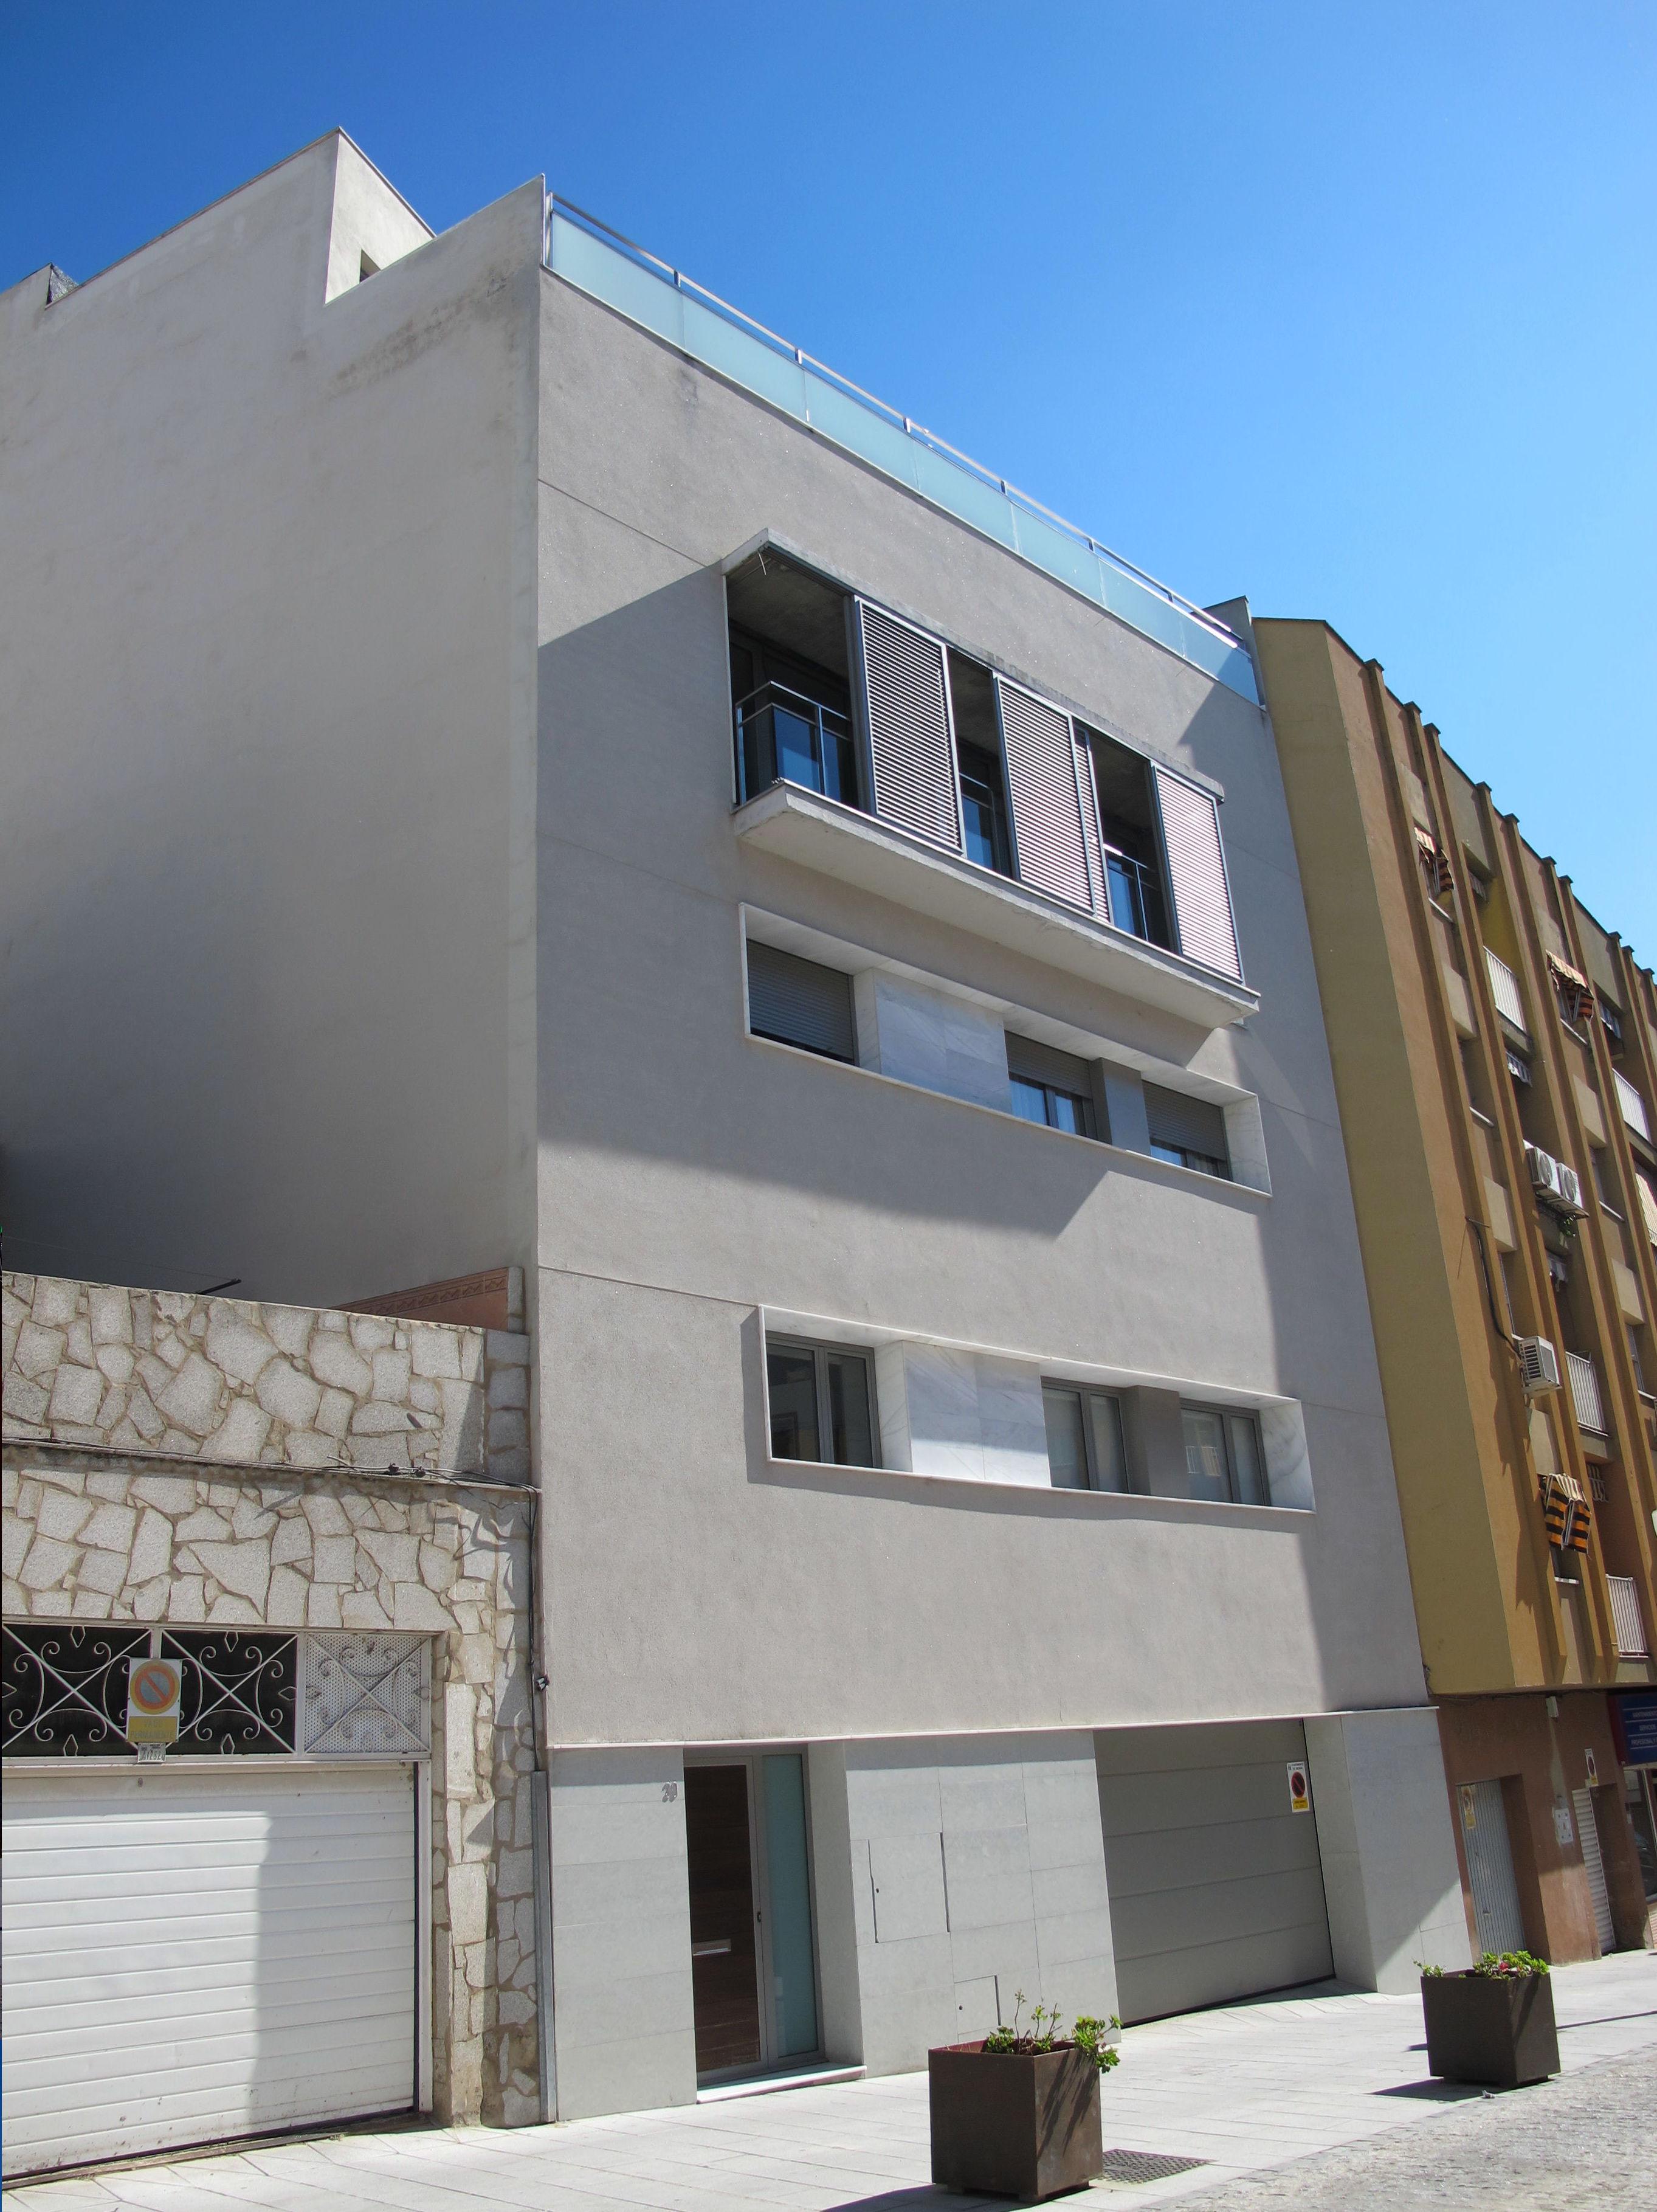 Vivienda en calle Morería (Mérida)